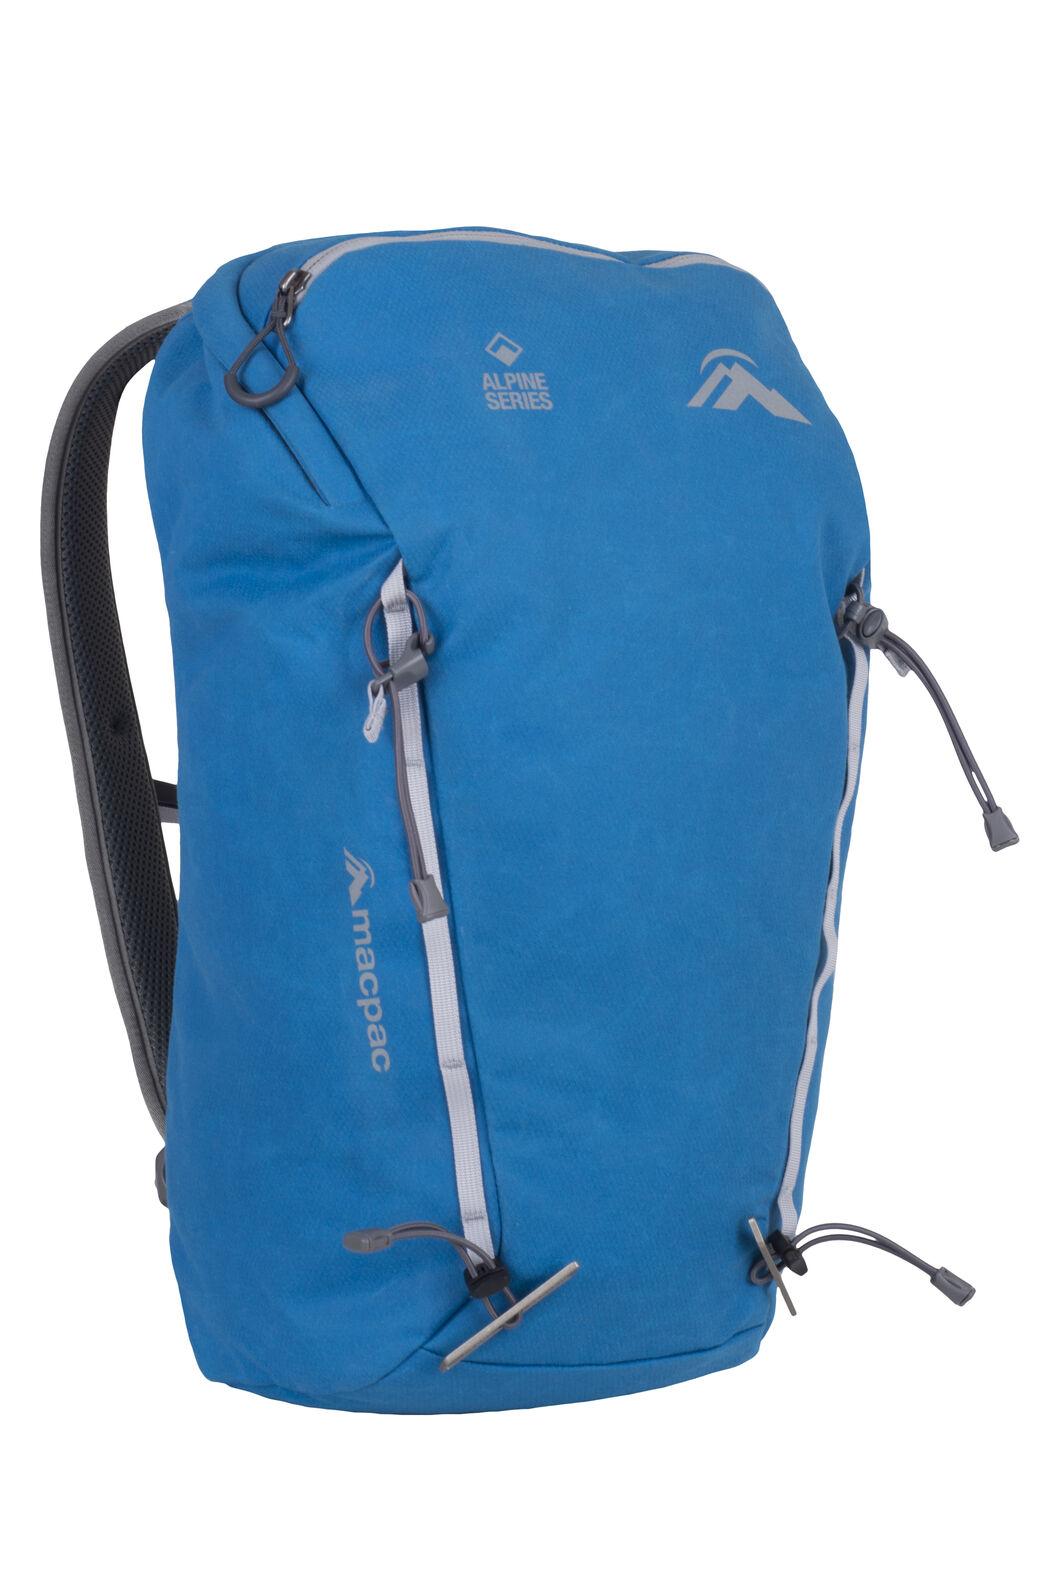 Macpac NZAT Summit Aztec® 24L Pack, Mykonos, hi-res